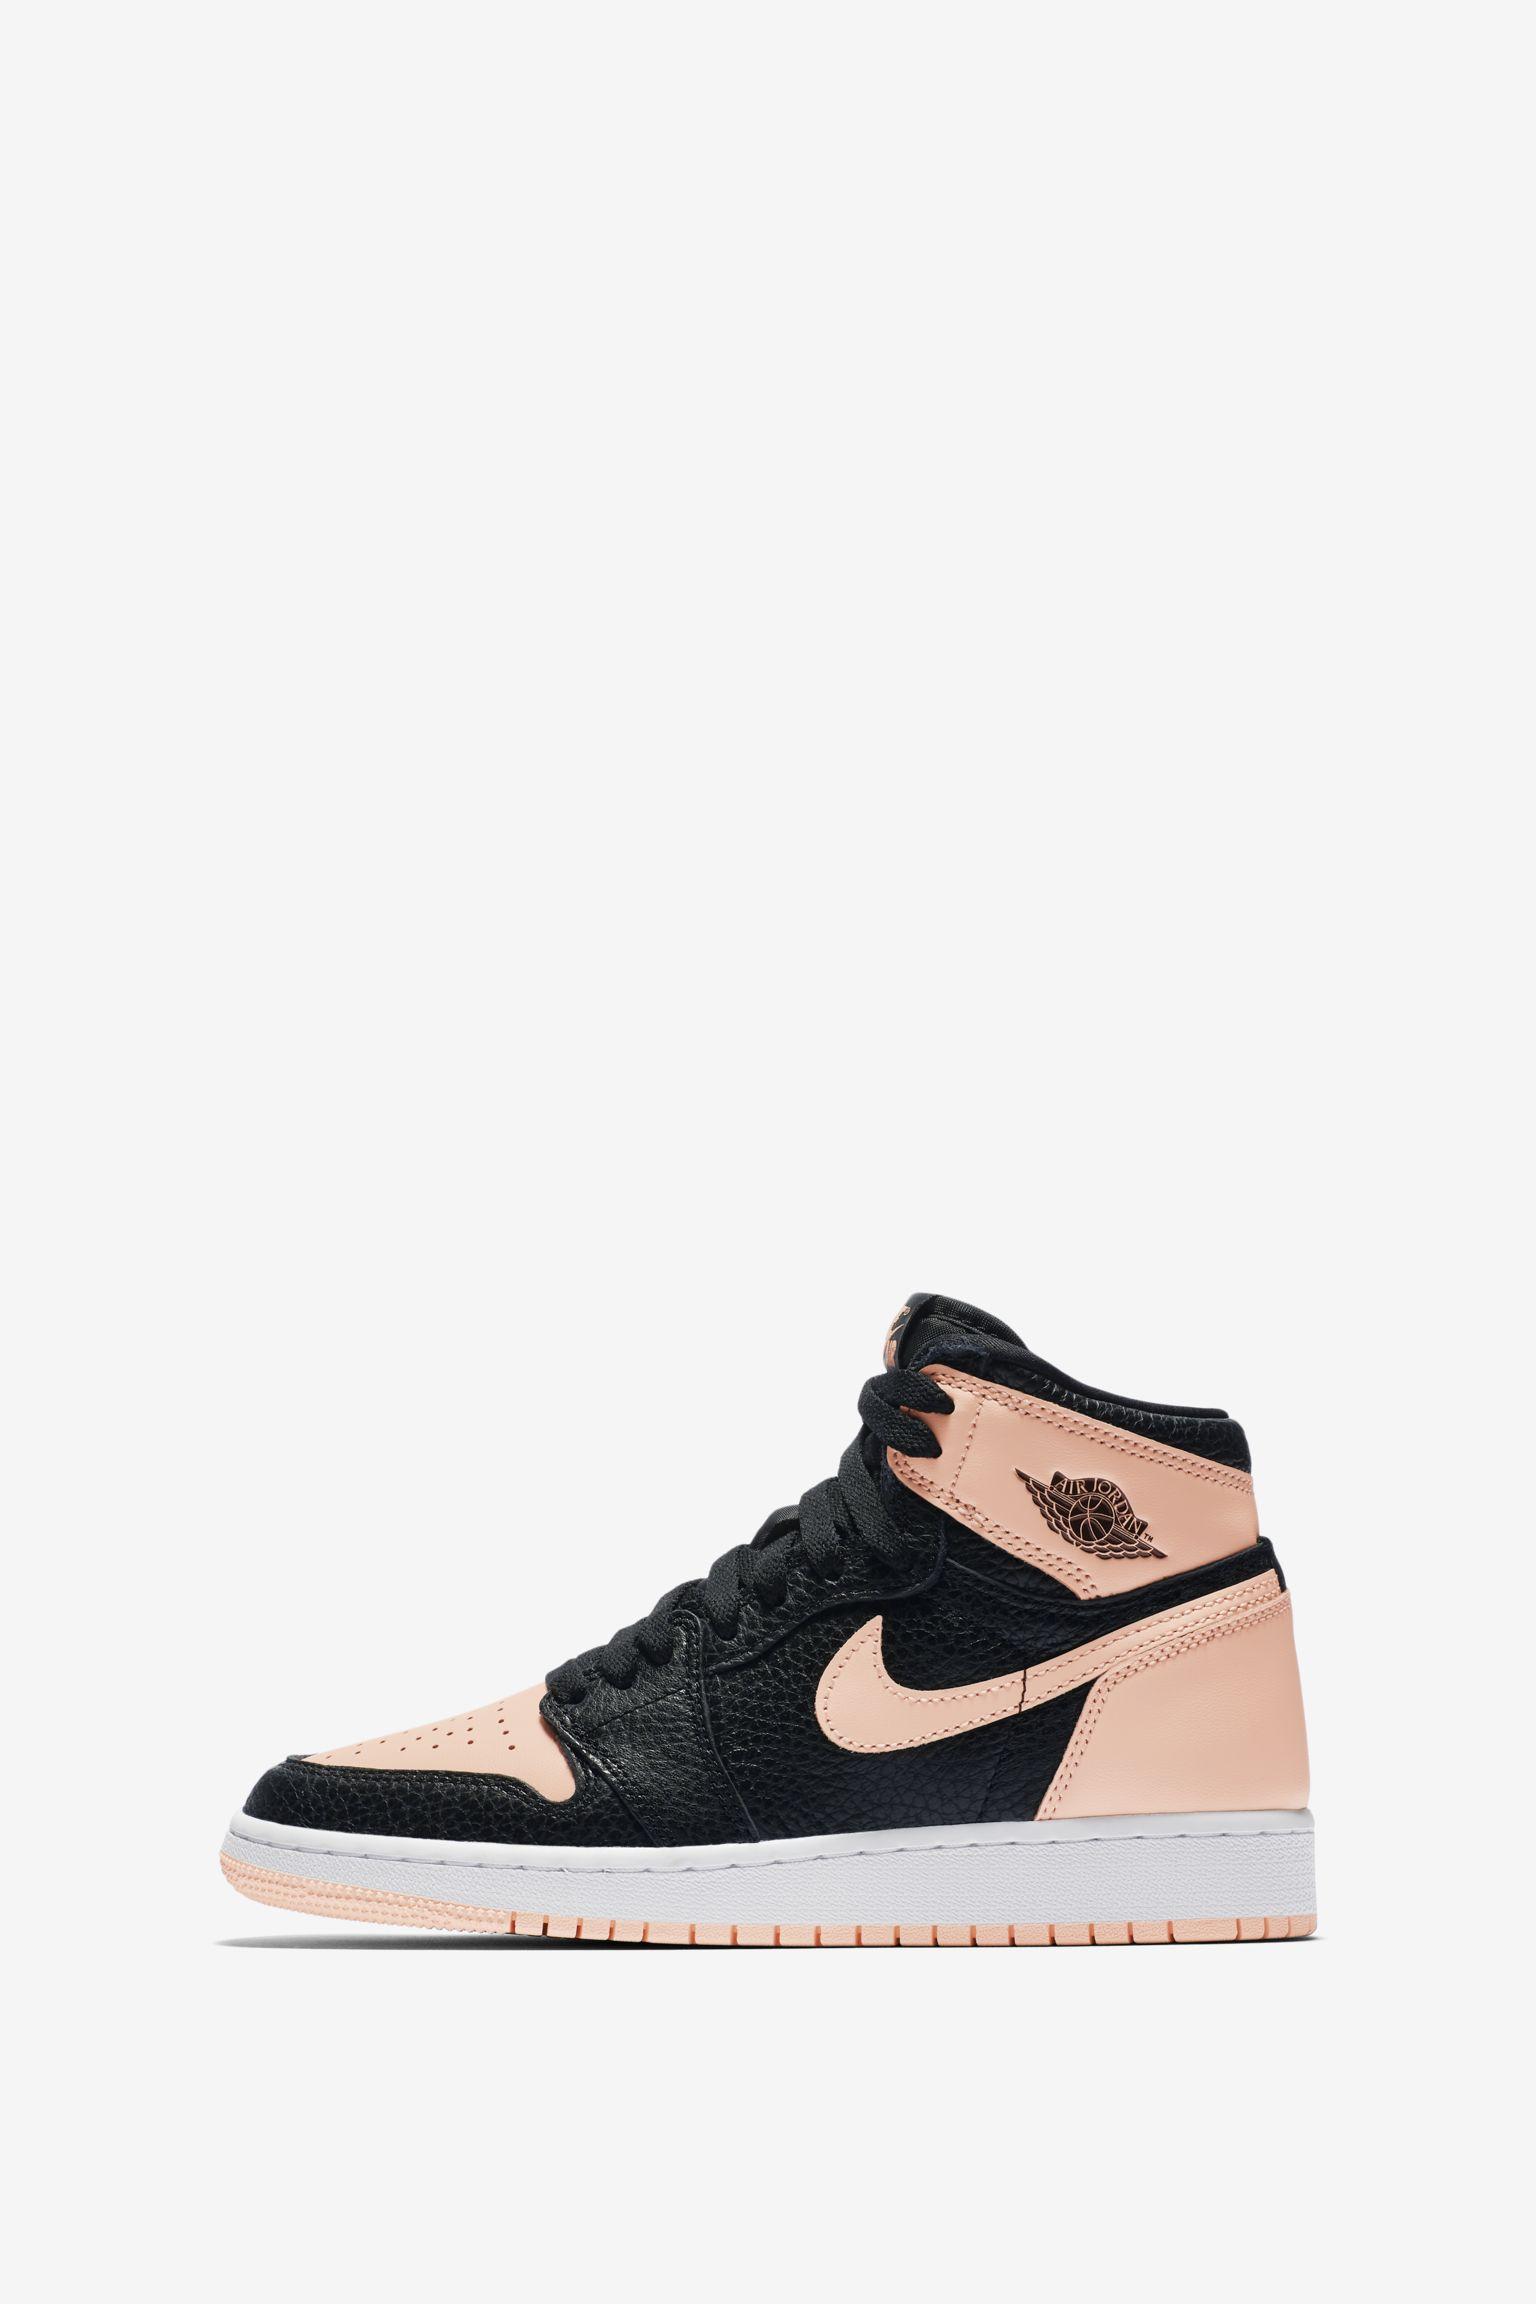 Air Jordan 1 'Black & Hyper Pink' Release Date. Nike SNKRS